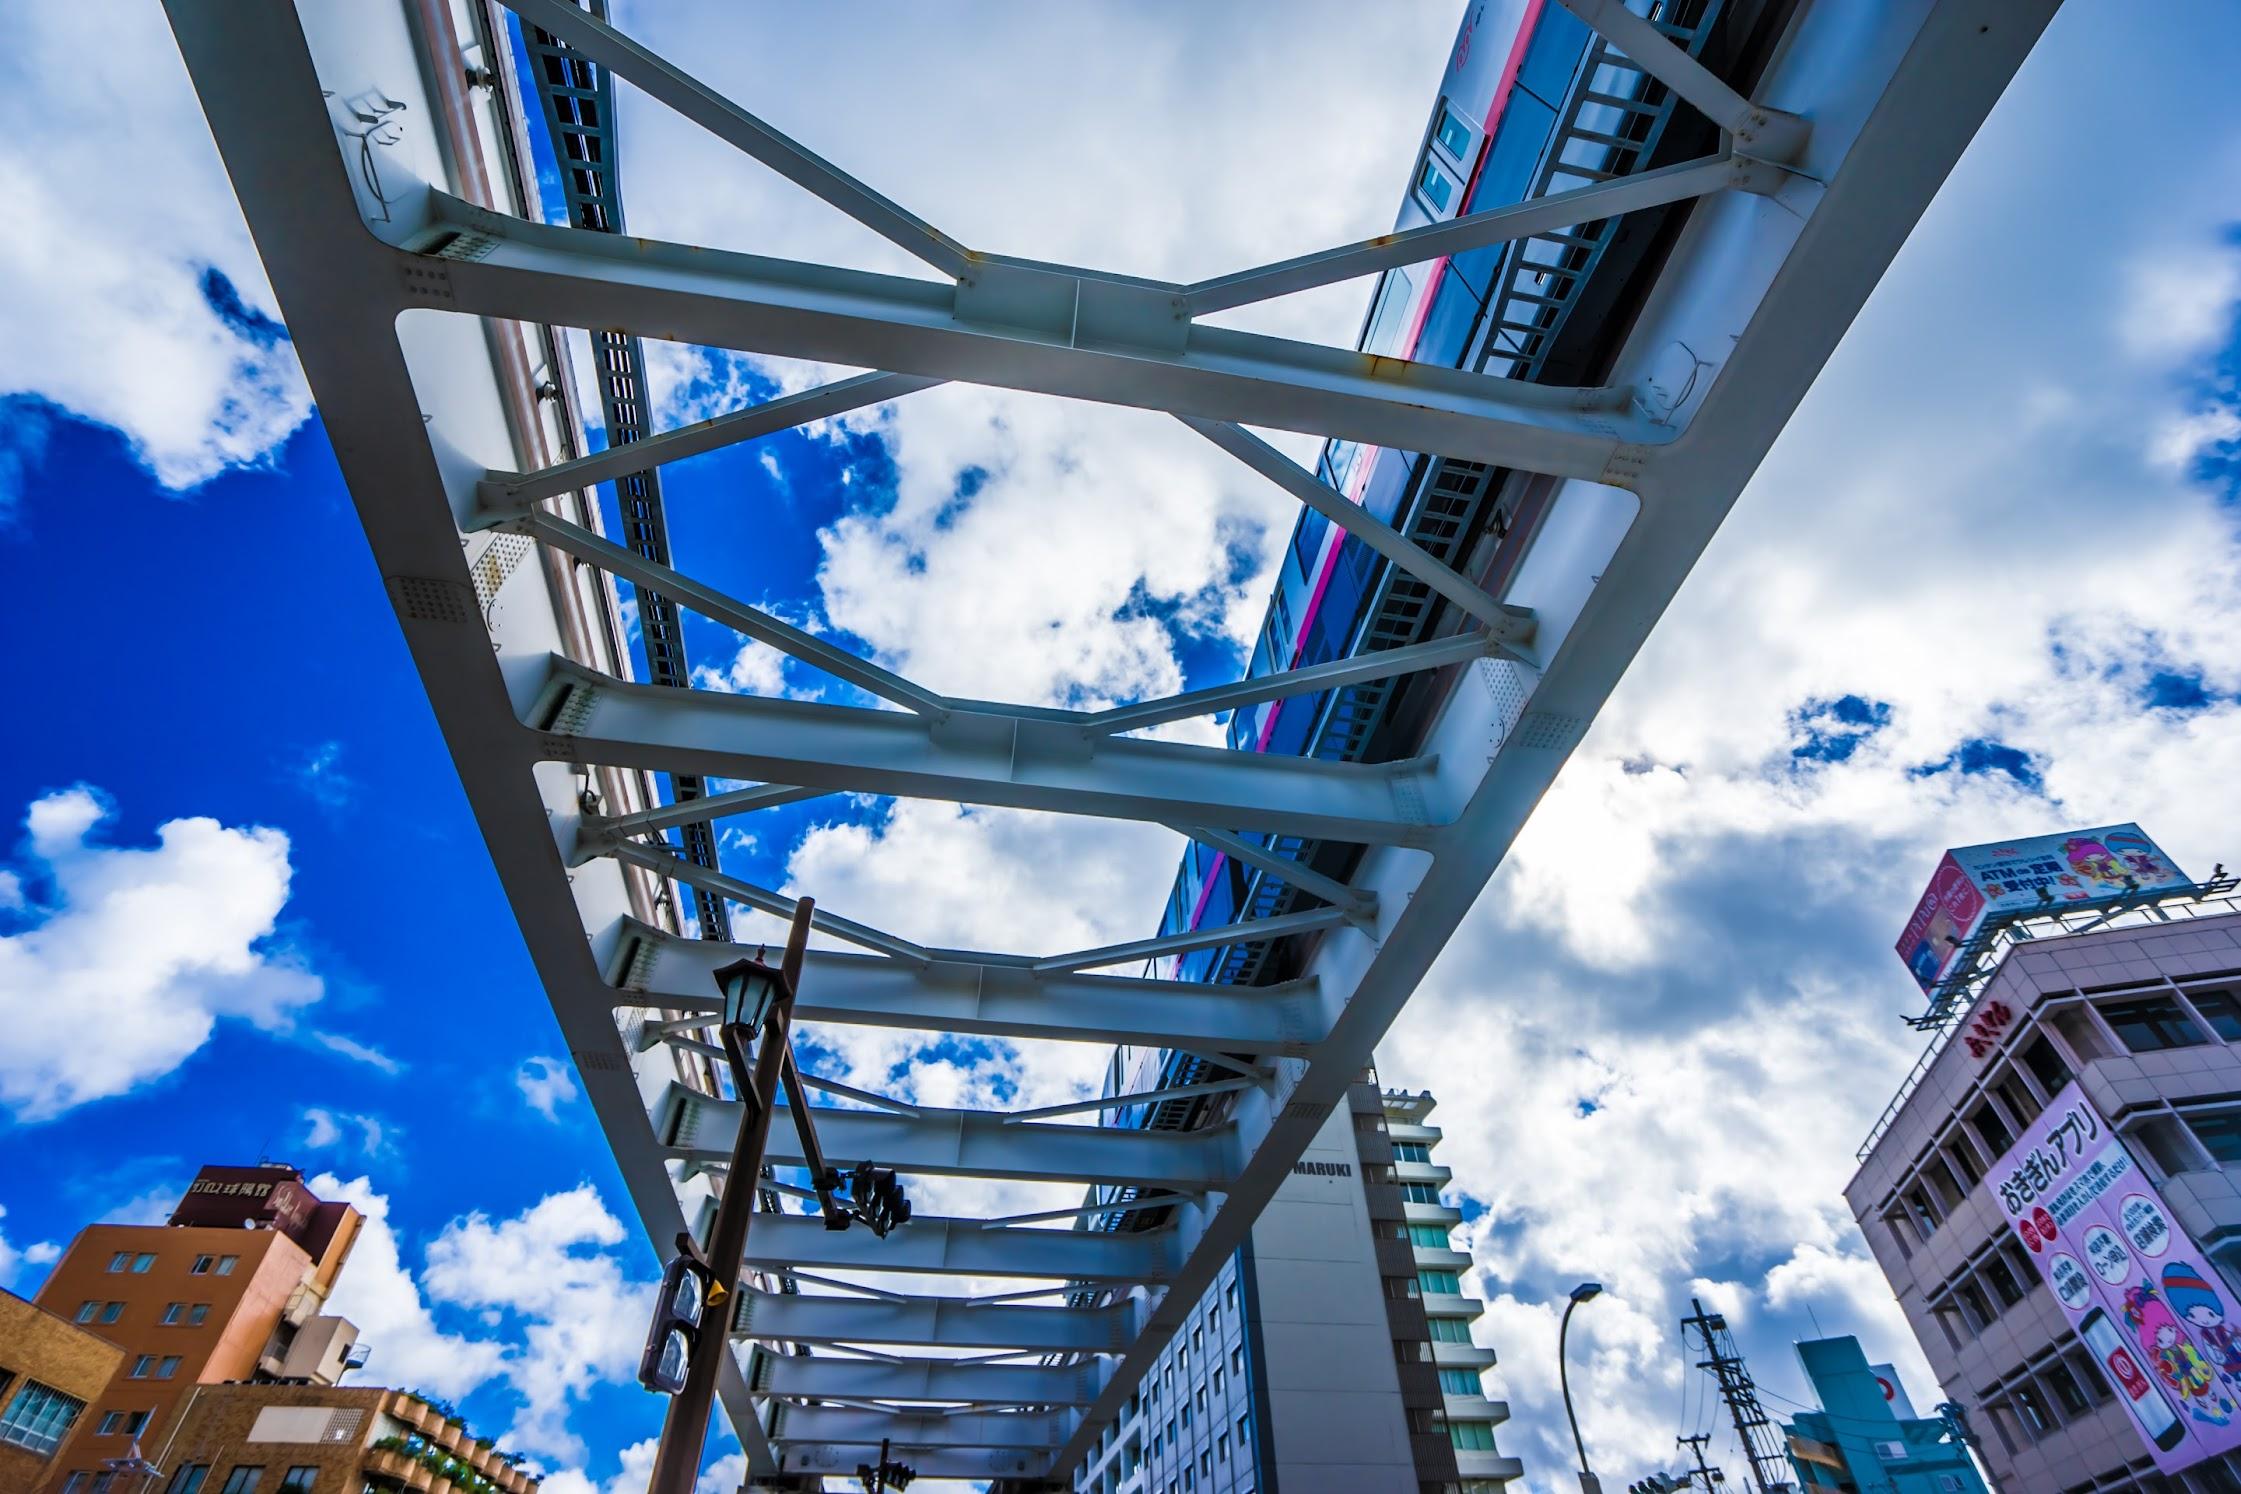 Naha monorail3